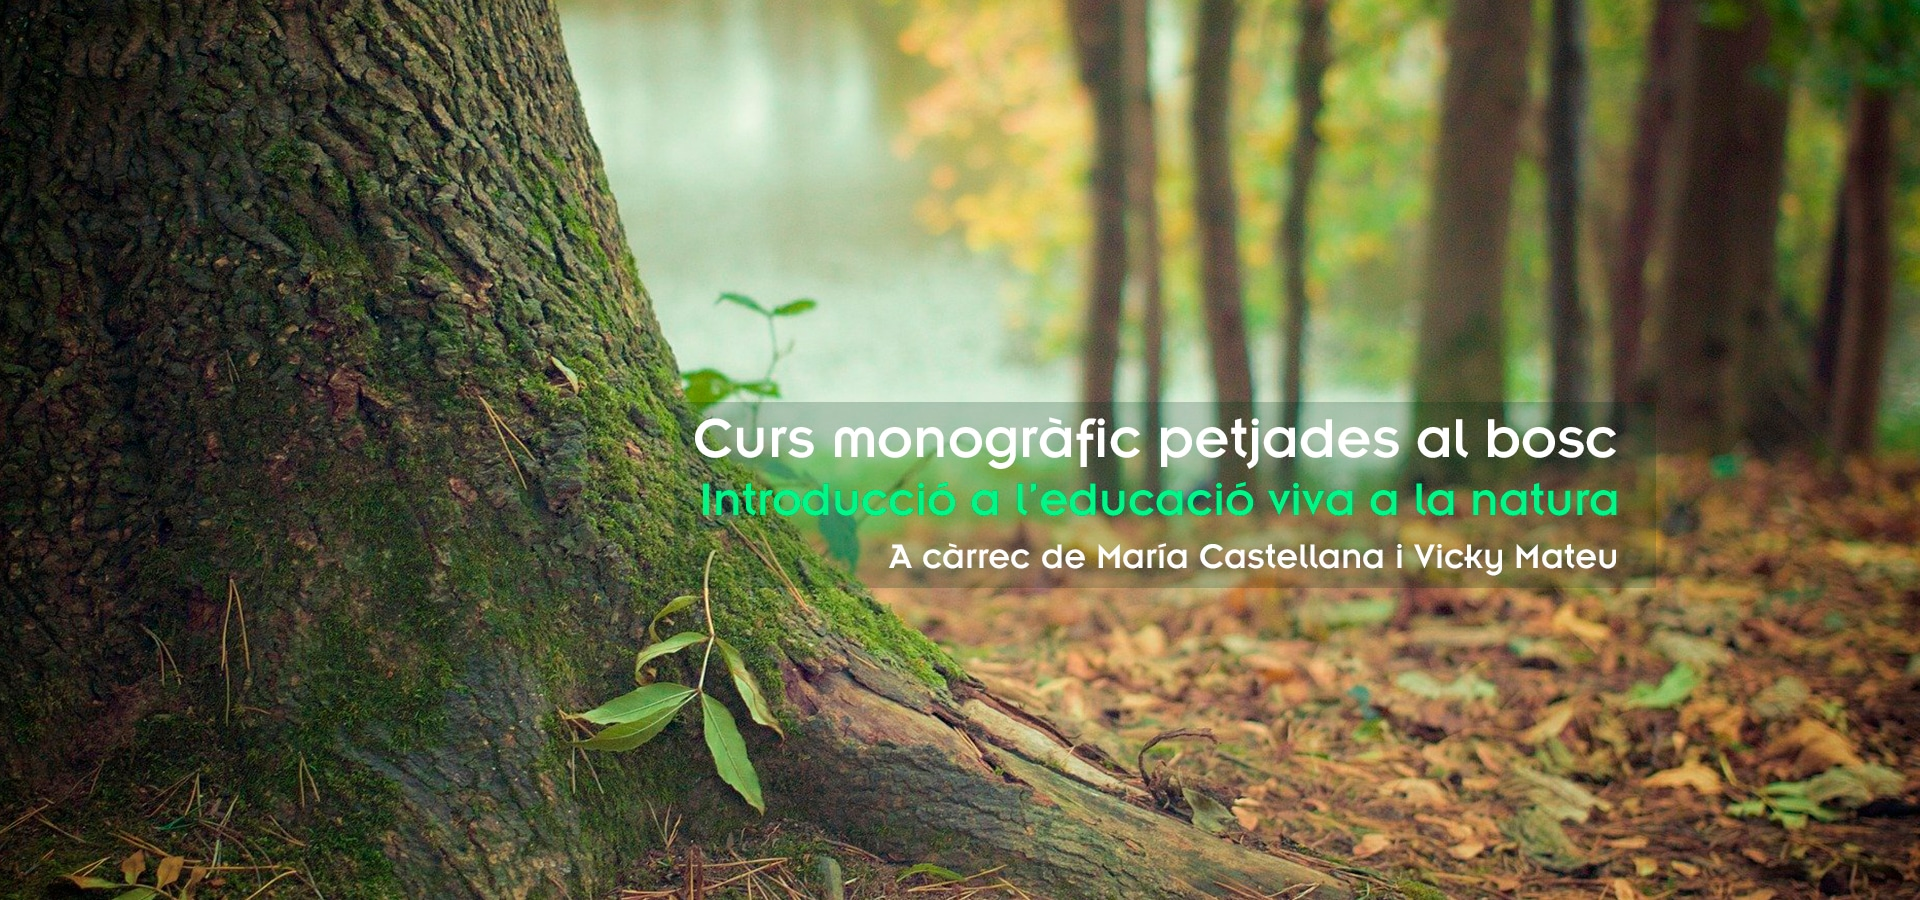 monografico petjades al bosc